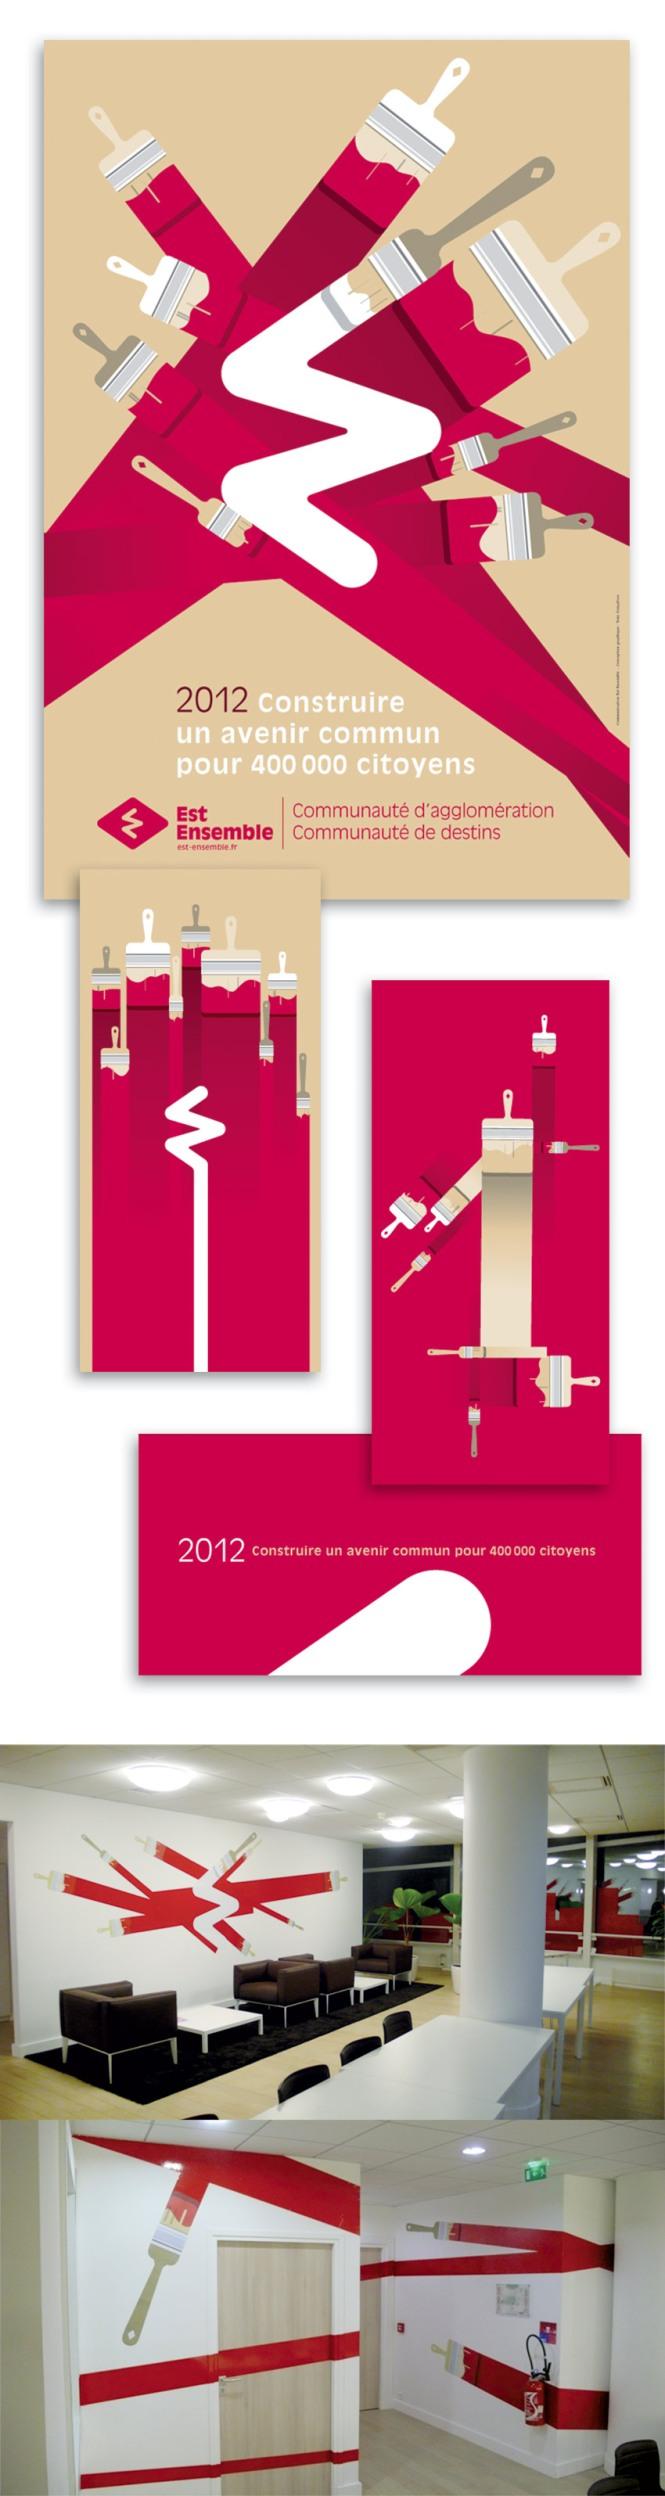 Vœux Est Ensemble 2012